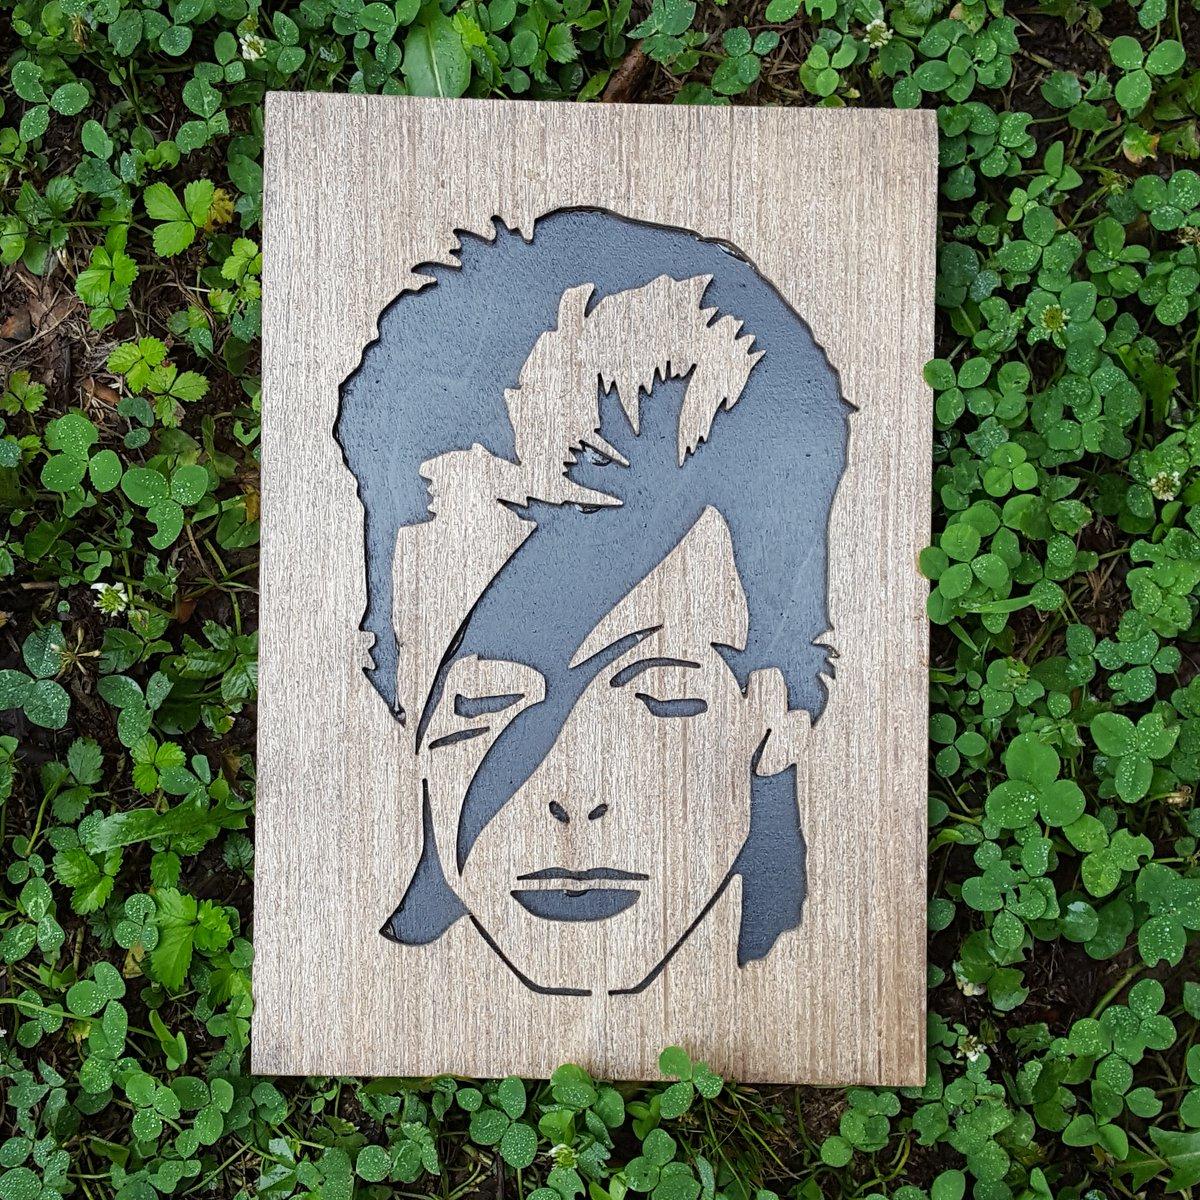 #ArtisanPirate #artisan #pirate #maker #mentor #artist #woodworker #teacher #entrepreneur #follow #scrollsaw #wood #woodwork #woodworking #handmade #diy #fyp #music #Bowie #DavidBowie #icon #legend #musician #celebrity #art #craftsman #deltatools #GodBless #GodIsGood #Blessed https://t.co/tCMJub74xz